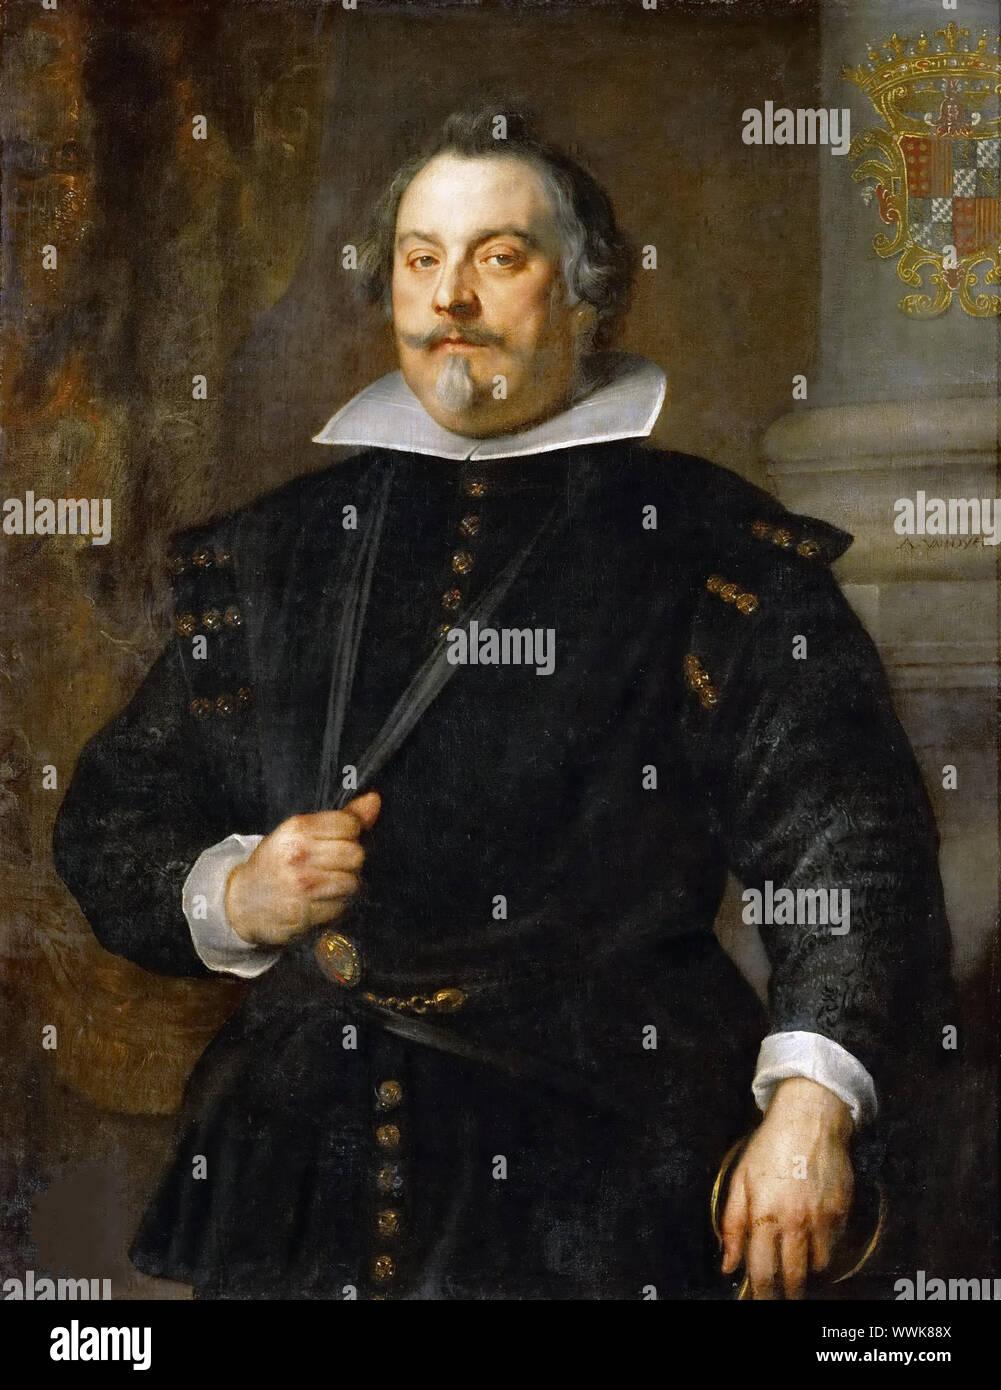 Francisco de Moncada, Marqués de Aytona , ca 1634. Found in the Collection of Art History Museum, Vienne. Stock Photo